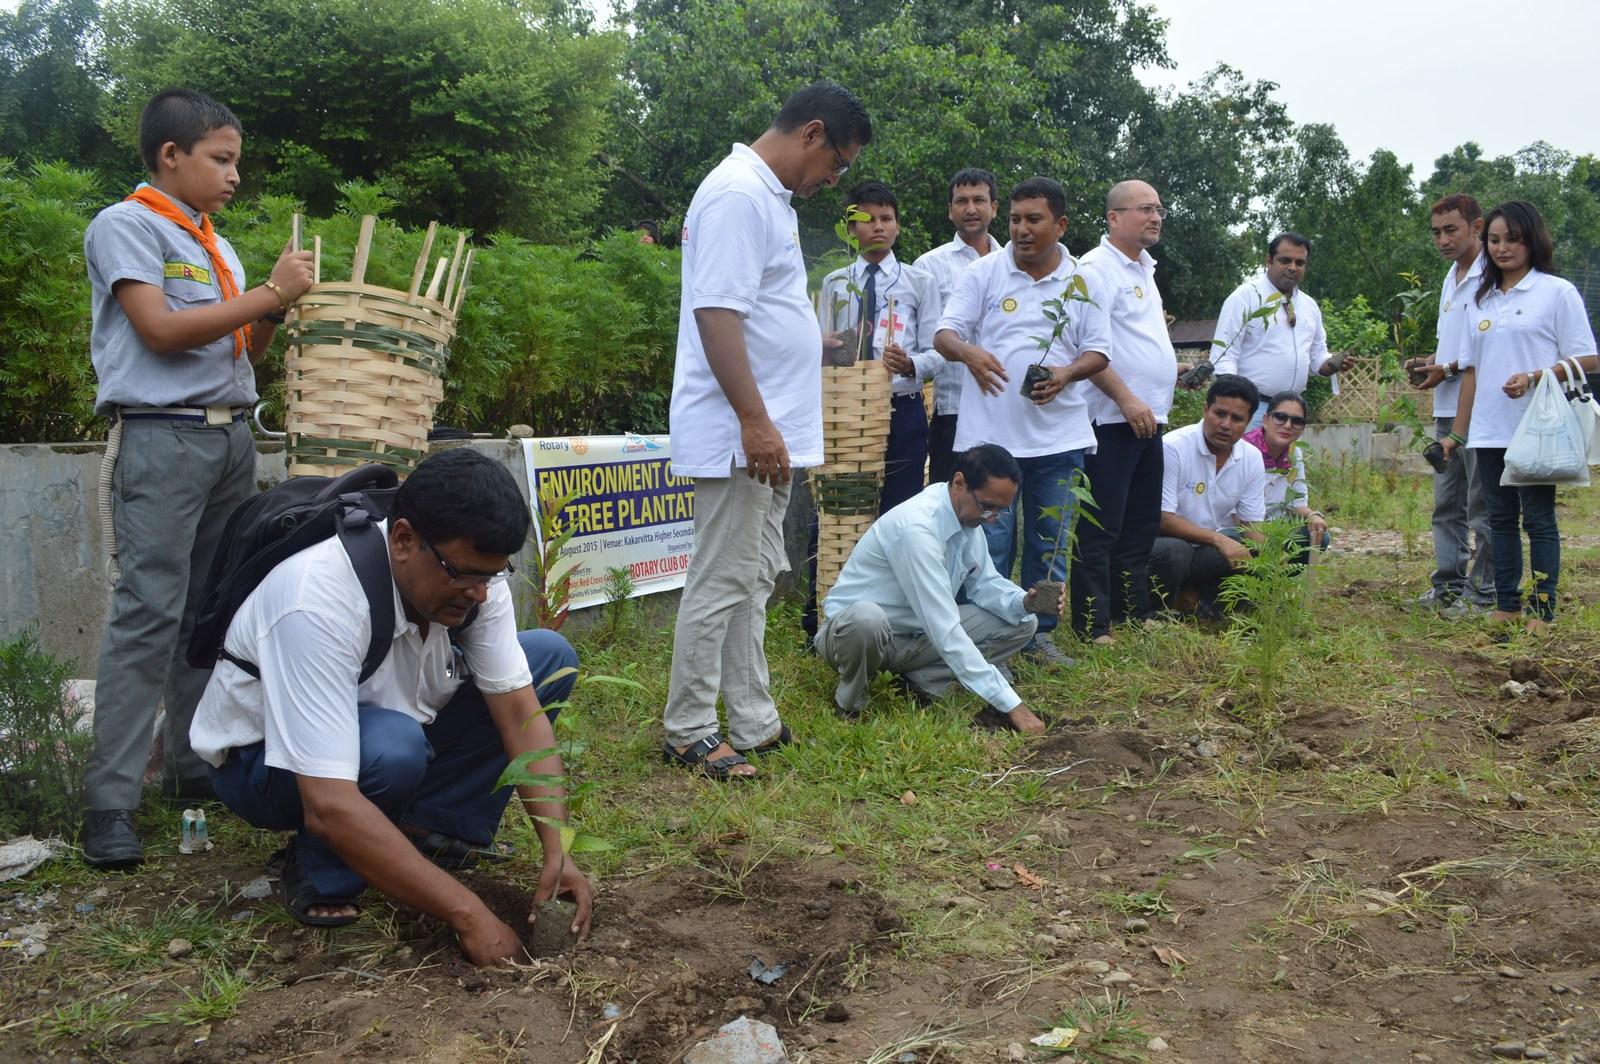 Enviroment Orientation Tree Plantation Rotary Club Of Kakarvitta 10